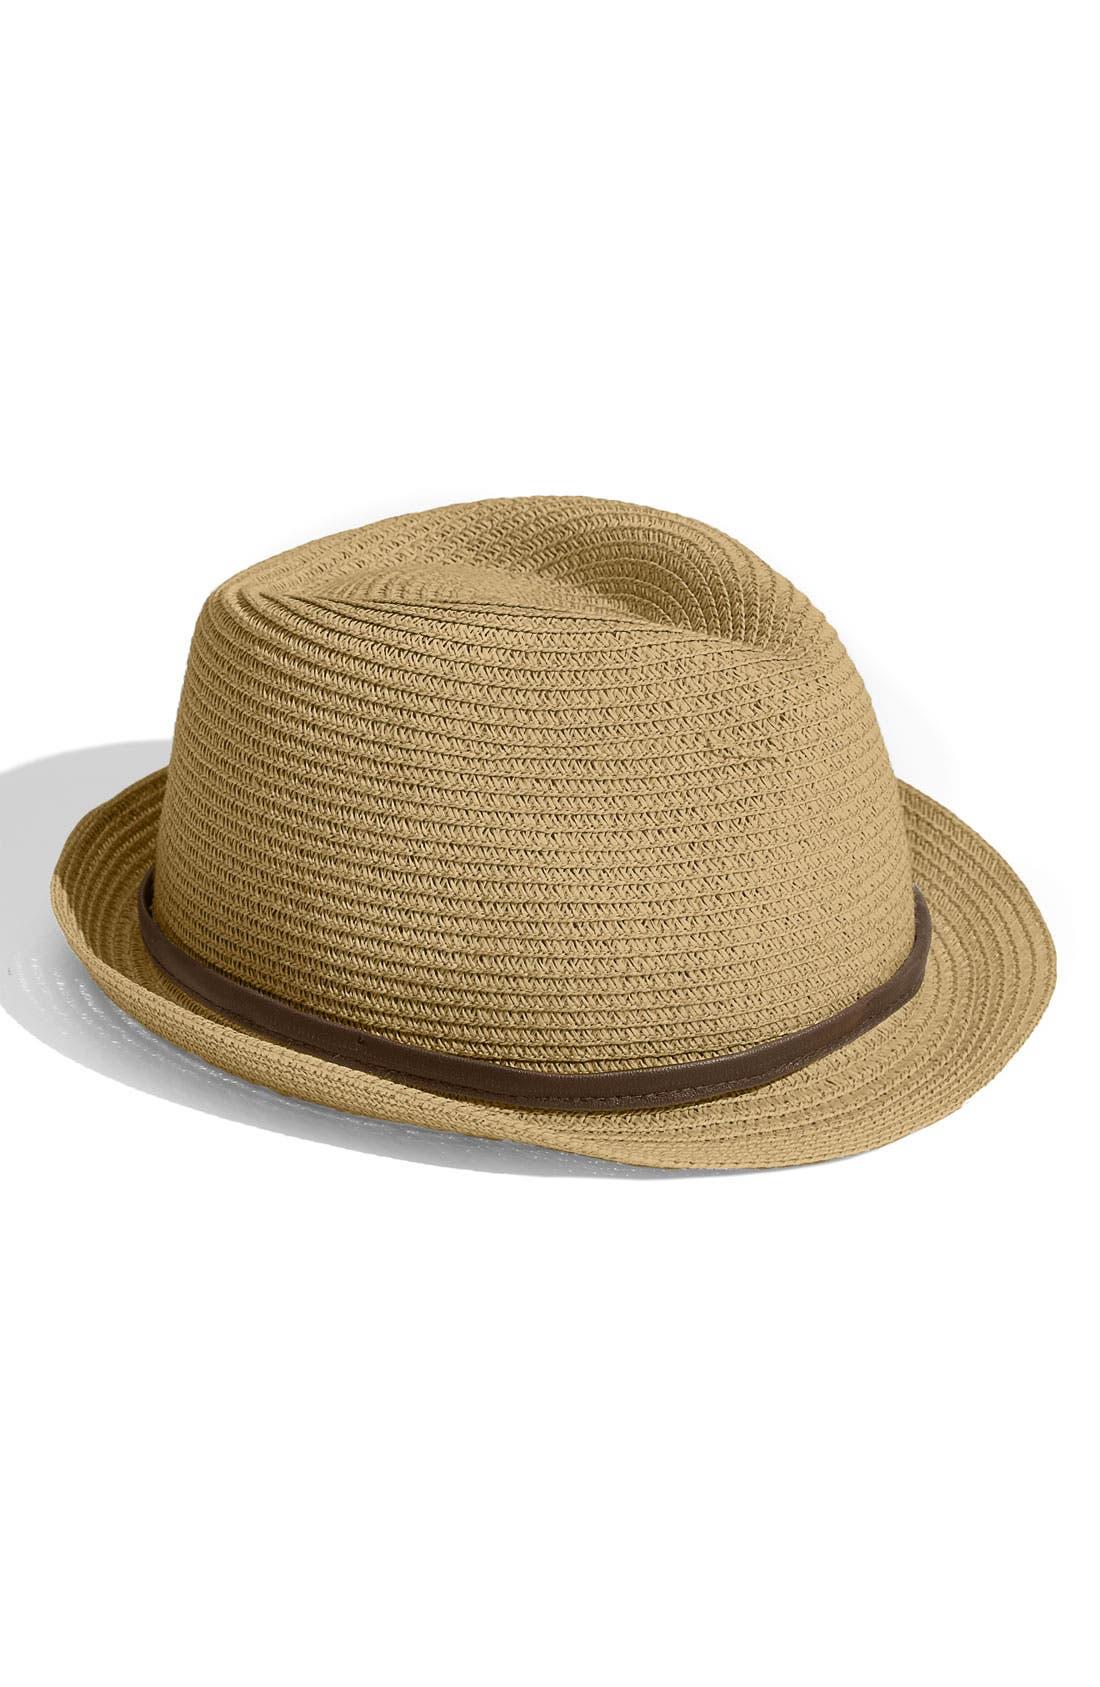 Main Image - Make + Model Straw Bowler Hat